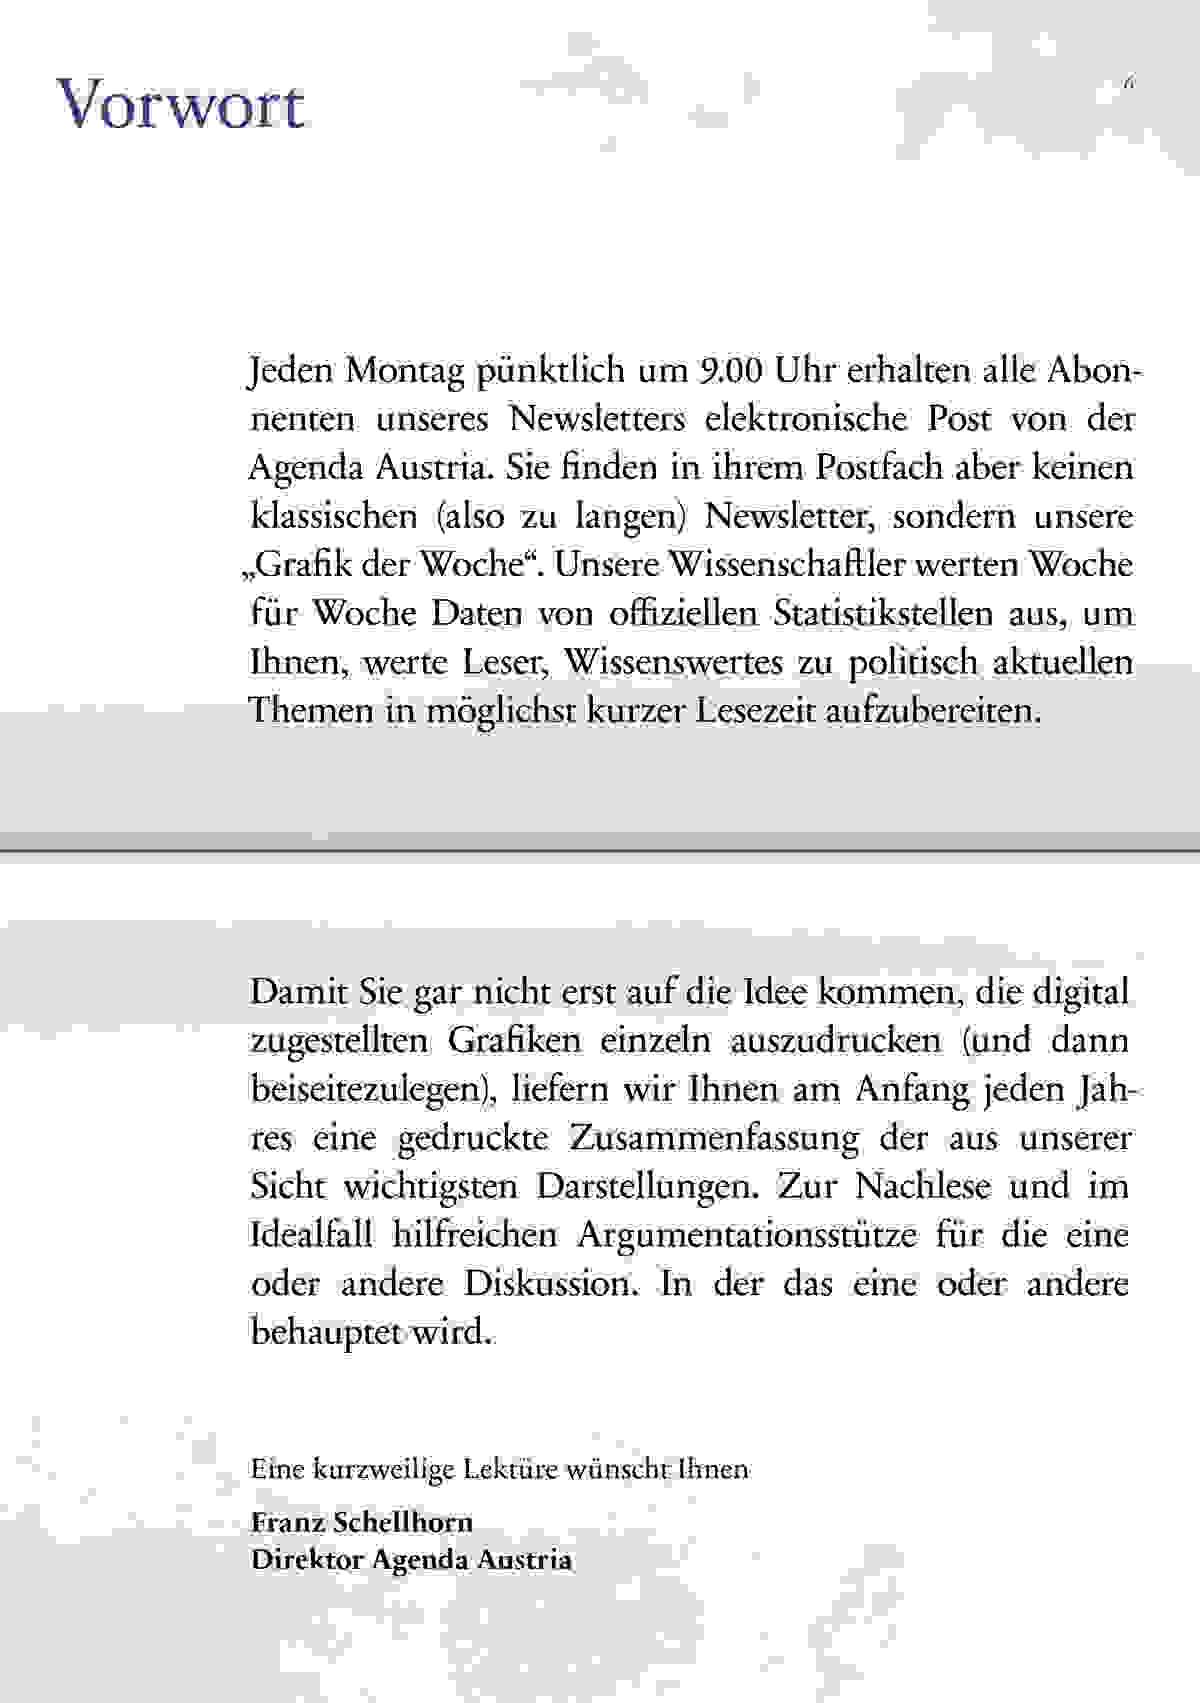 AA Gd W2018 Buch 1200x1703 DS 3